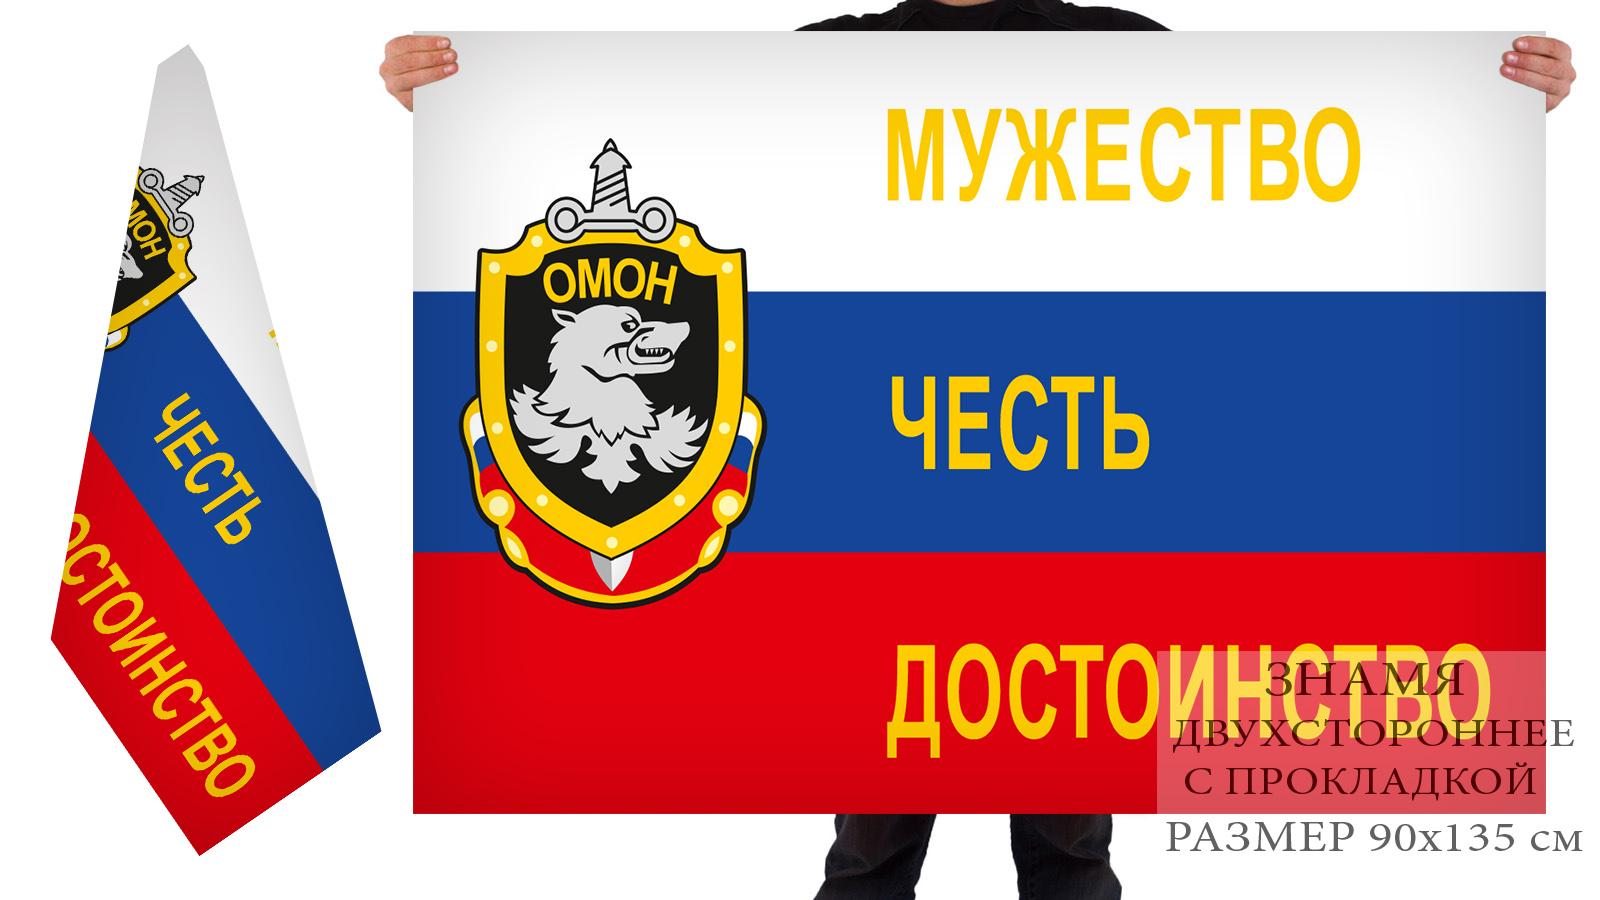 Двусторонний флаг ОМОНа